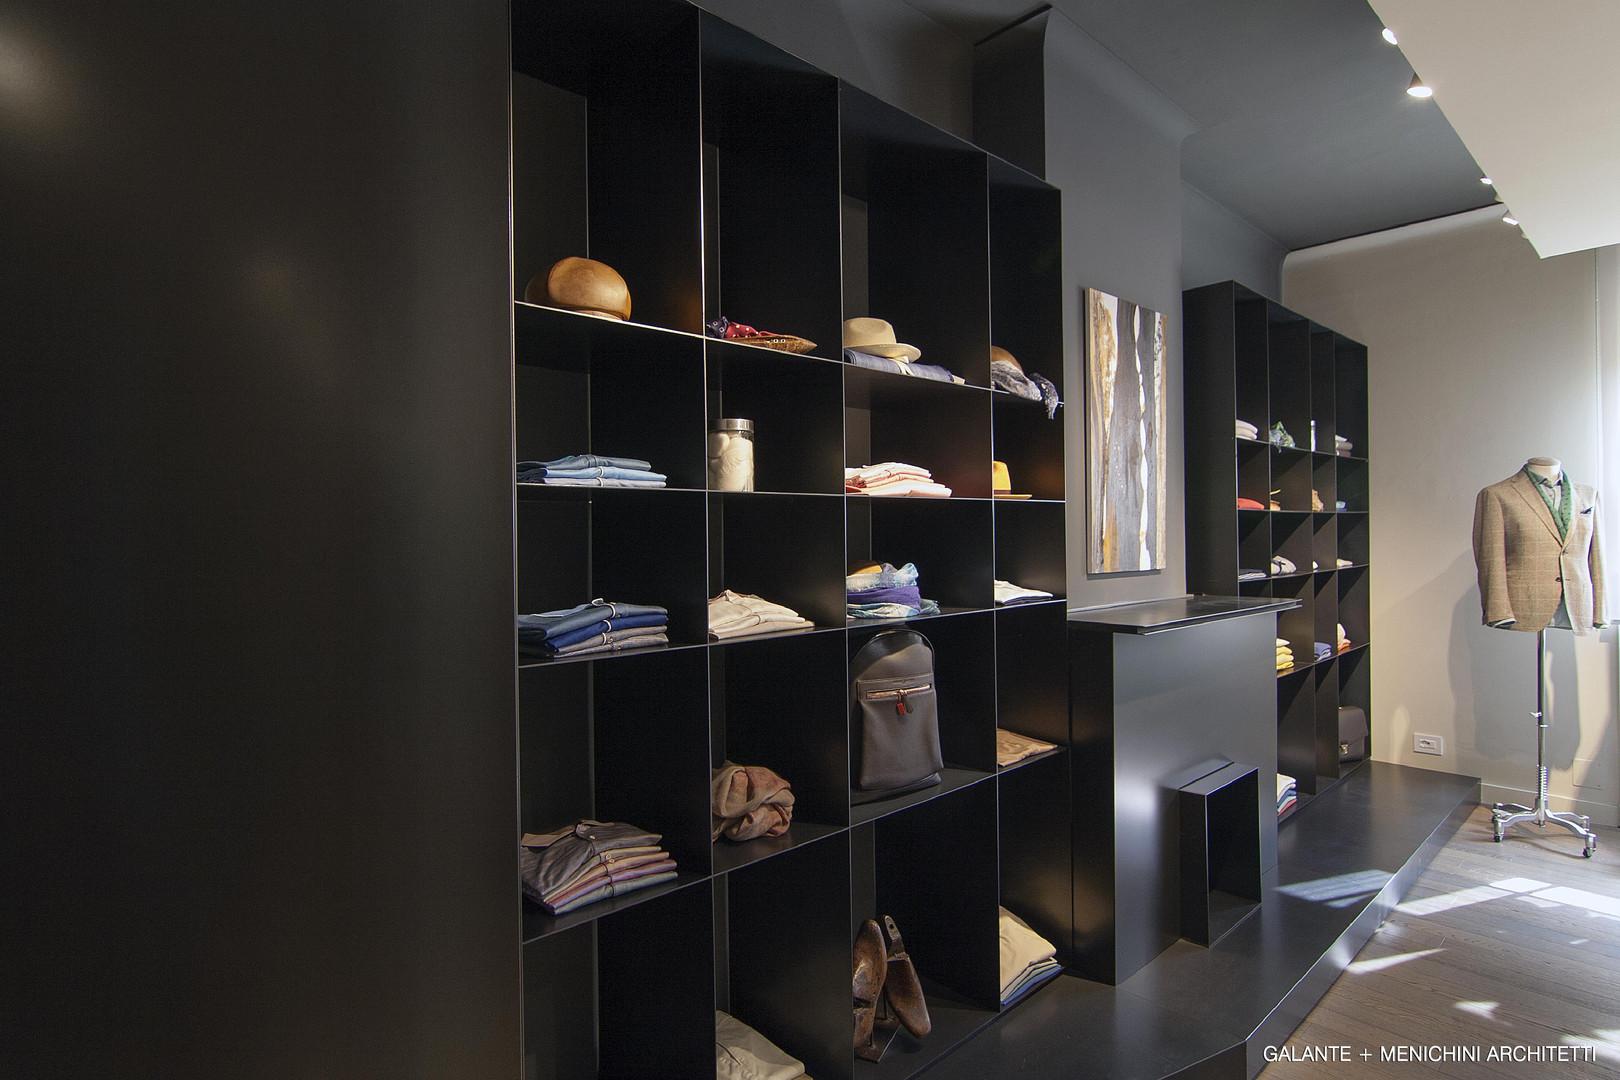 LB_showroom_04_LOW.jpg